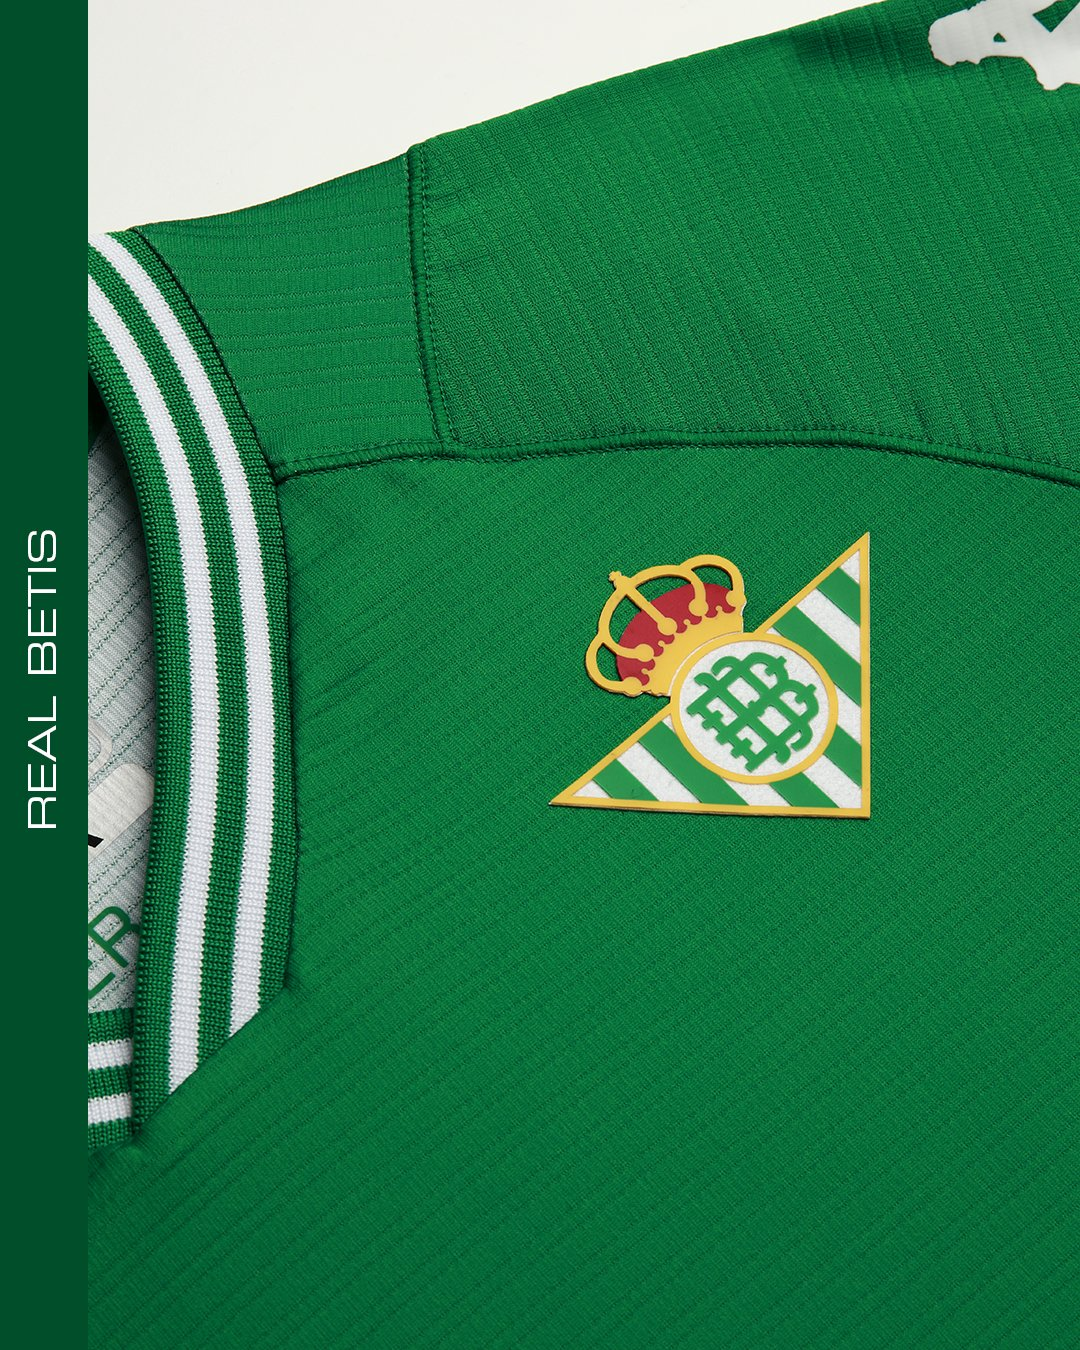 Maillot Betis 2021-2022 domicile